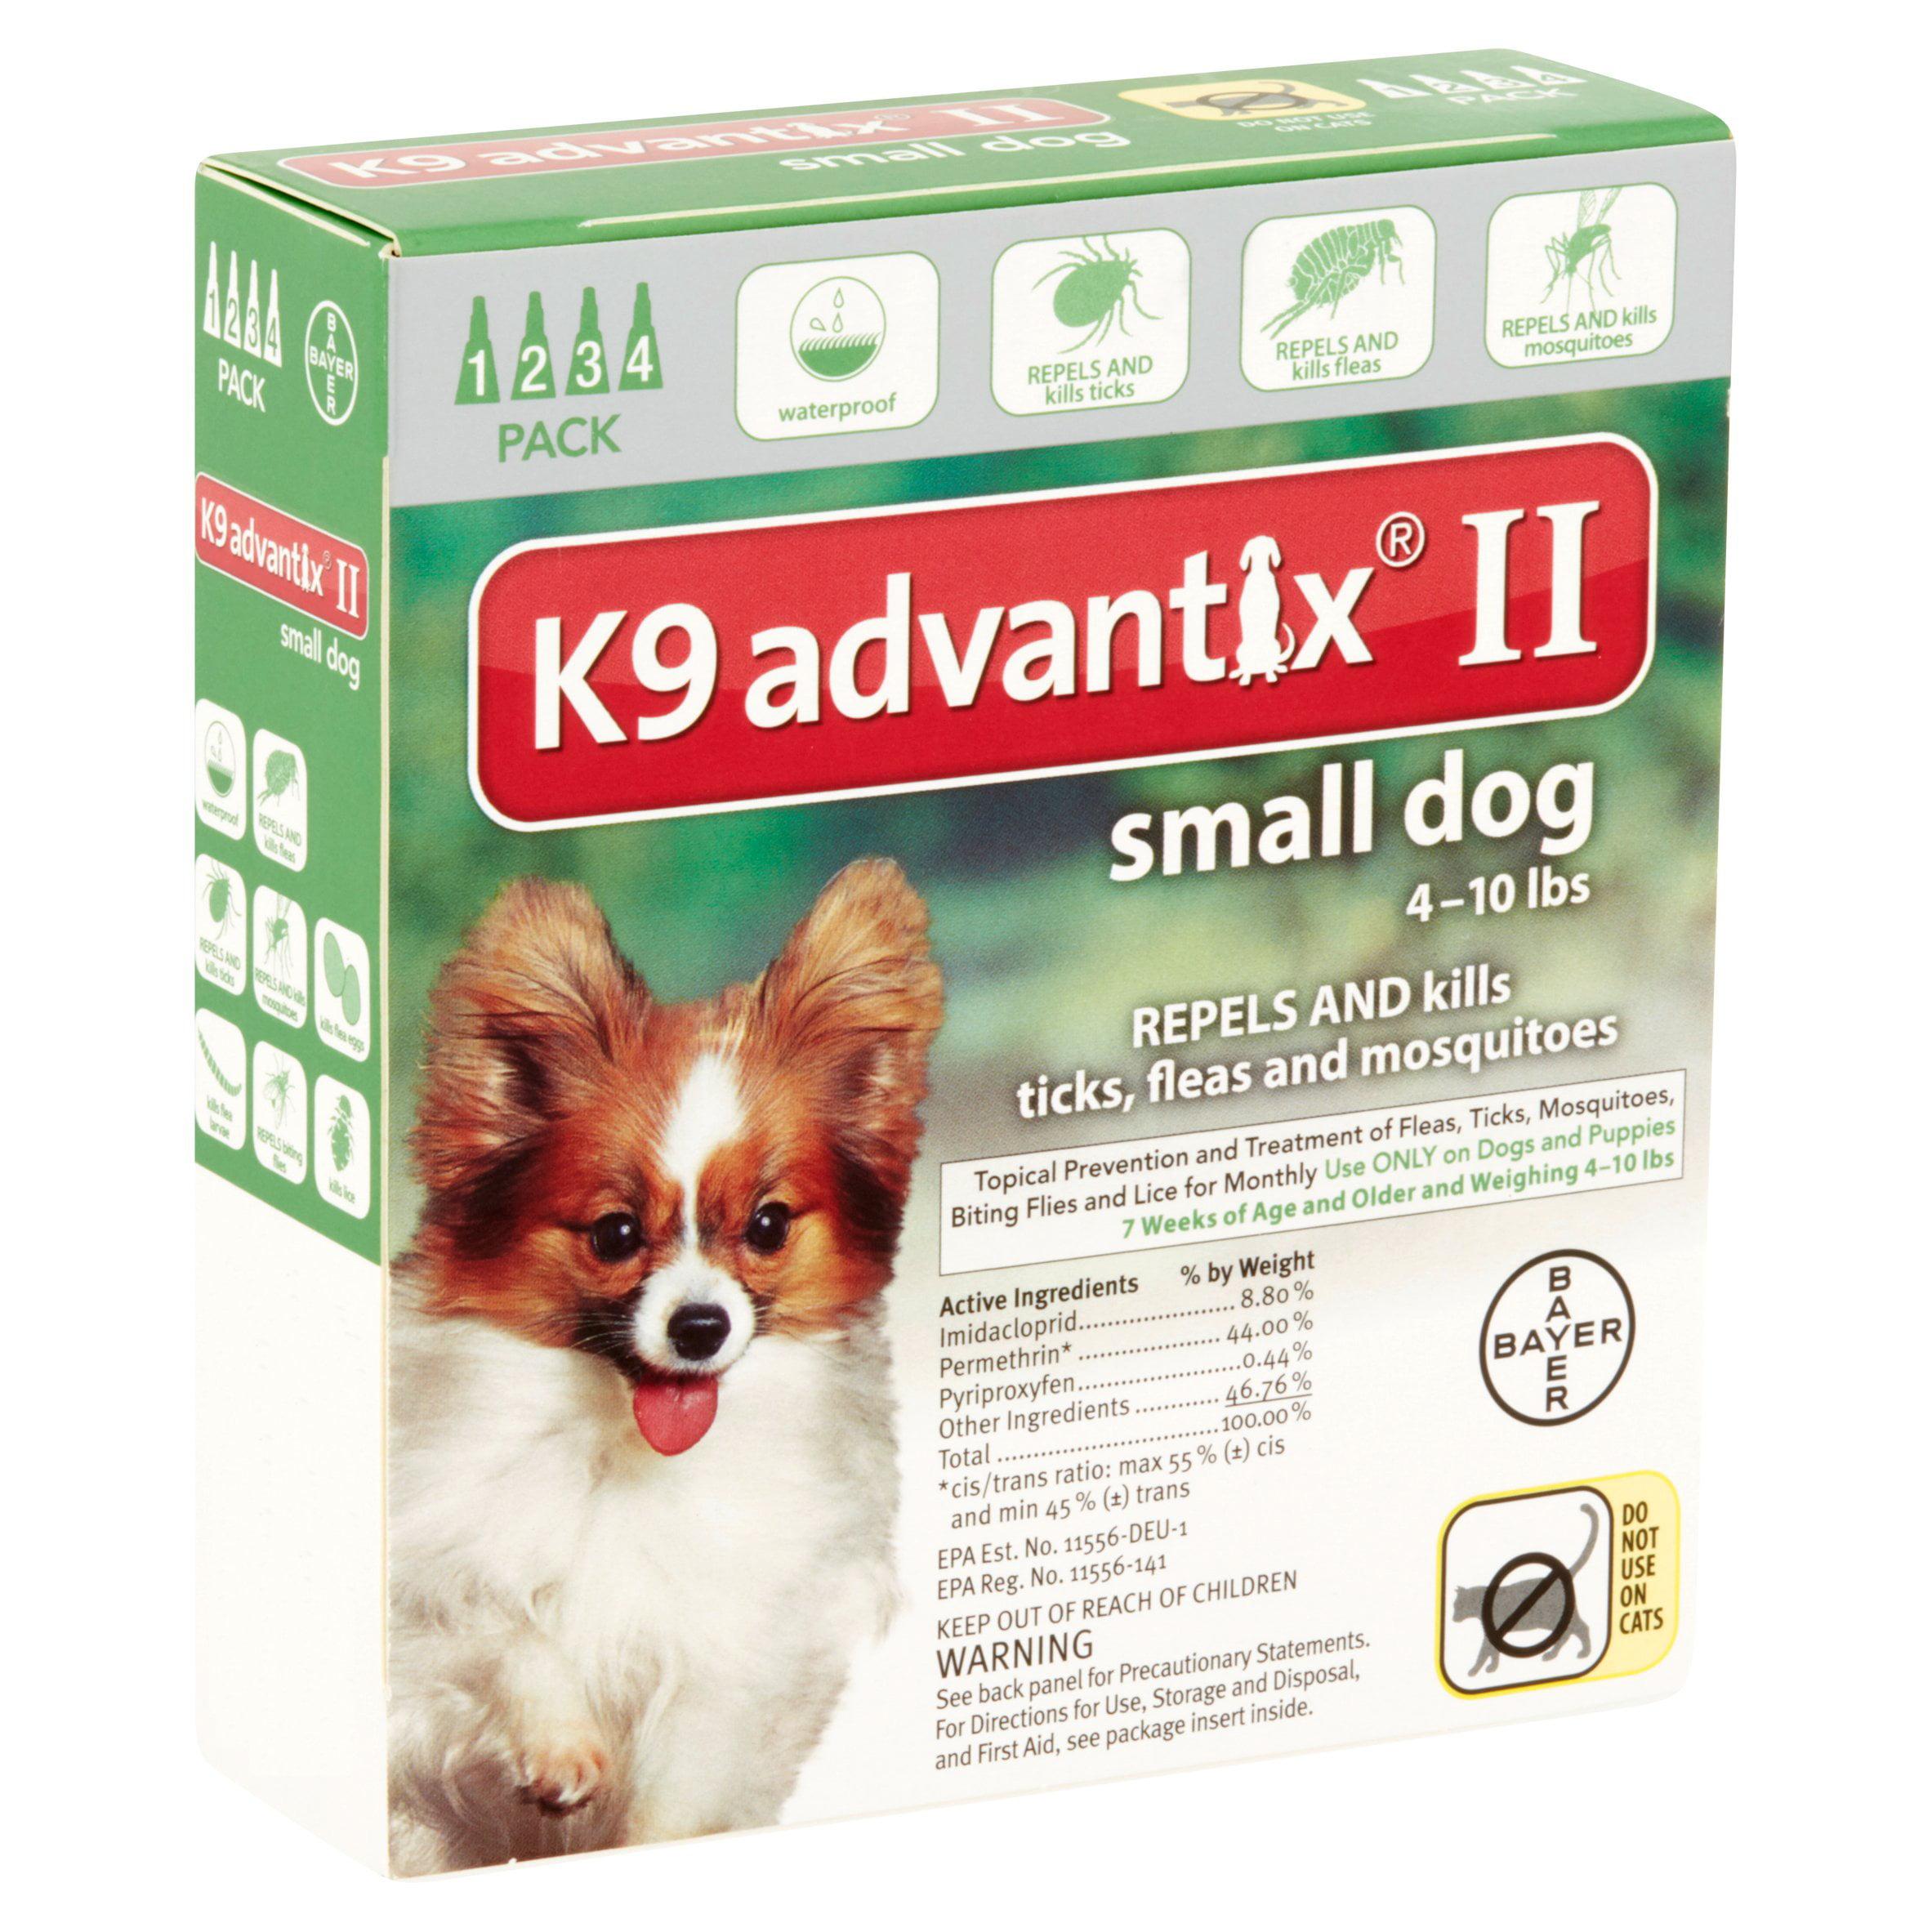 K9 advantix ii coupon 2018